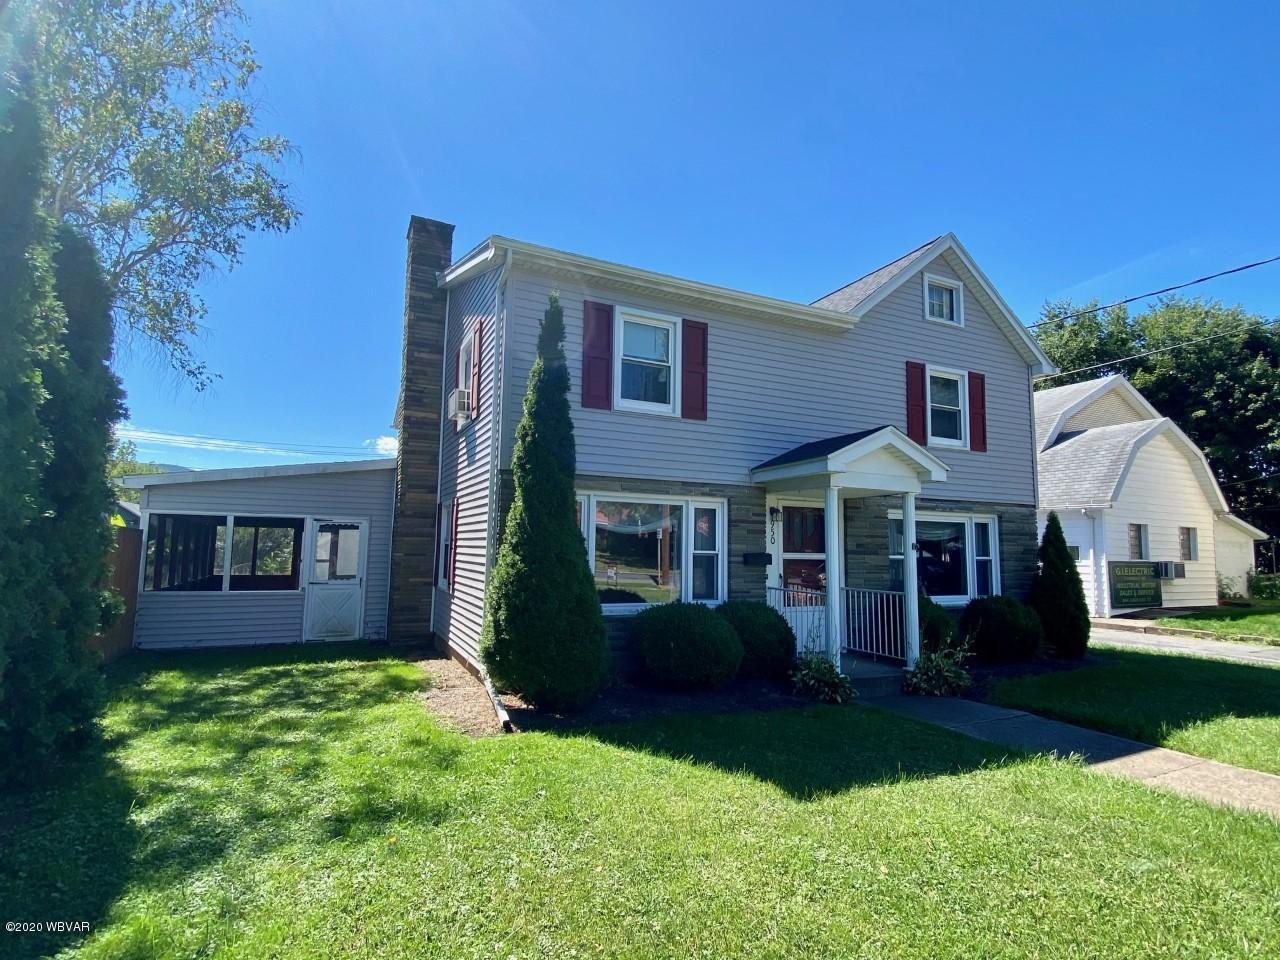 950 SHERIDAN STREET, Williamsport, PA 17701, 4 Bedrooms Bedrooms, ,2.5 BathroomsBathrooms,Residential,For sale,SHERIDAN,WB-89657